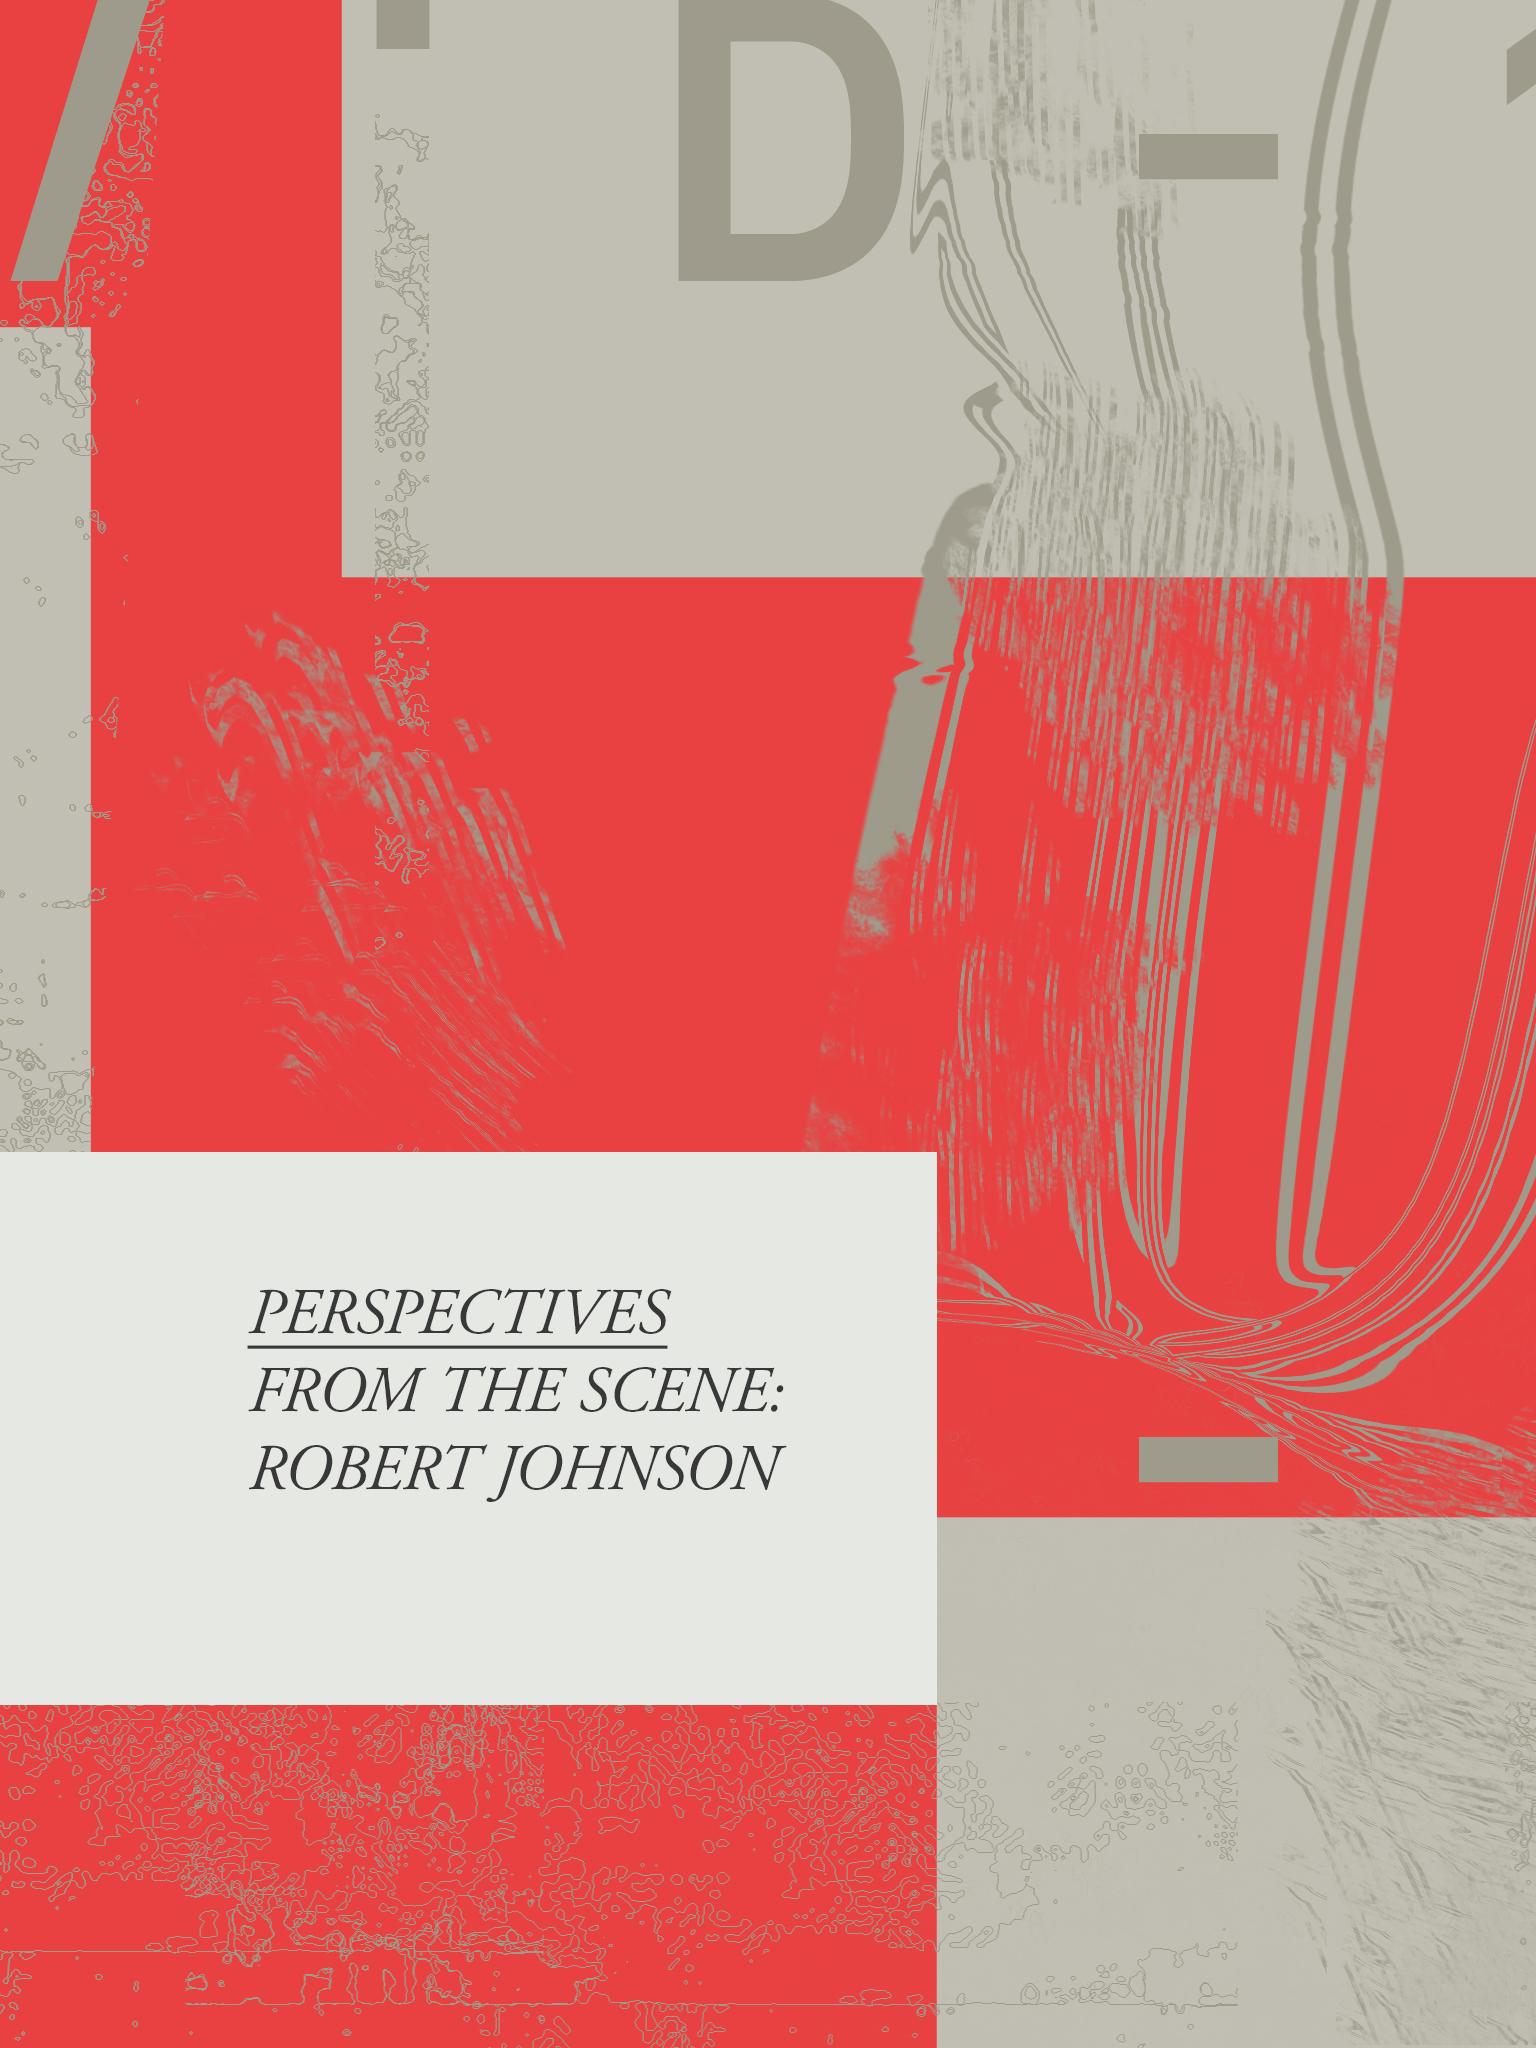 Perspectives From The Scene: Robert Johnson